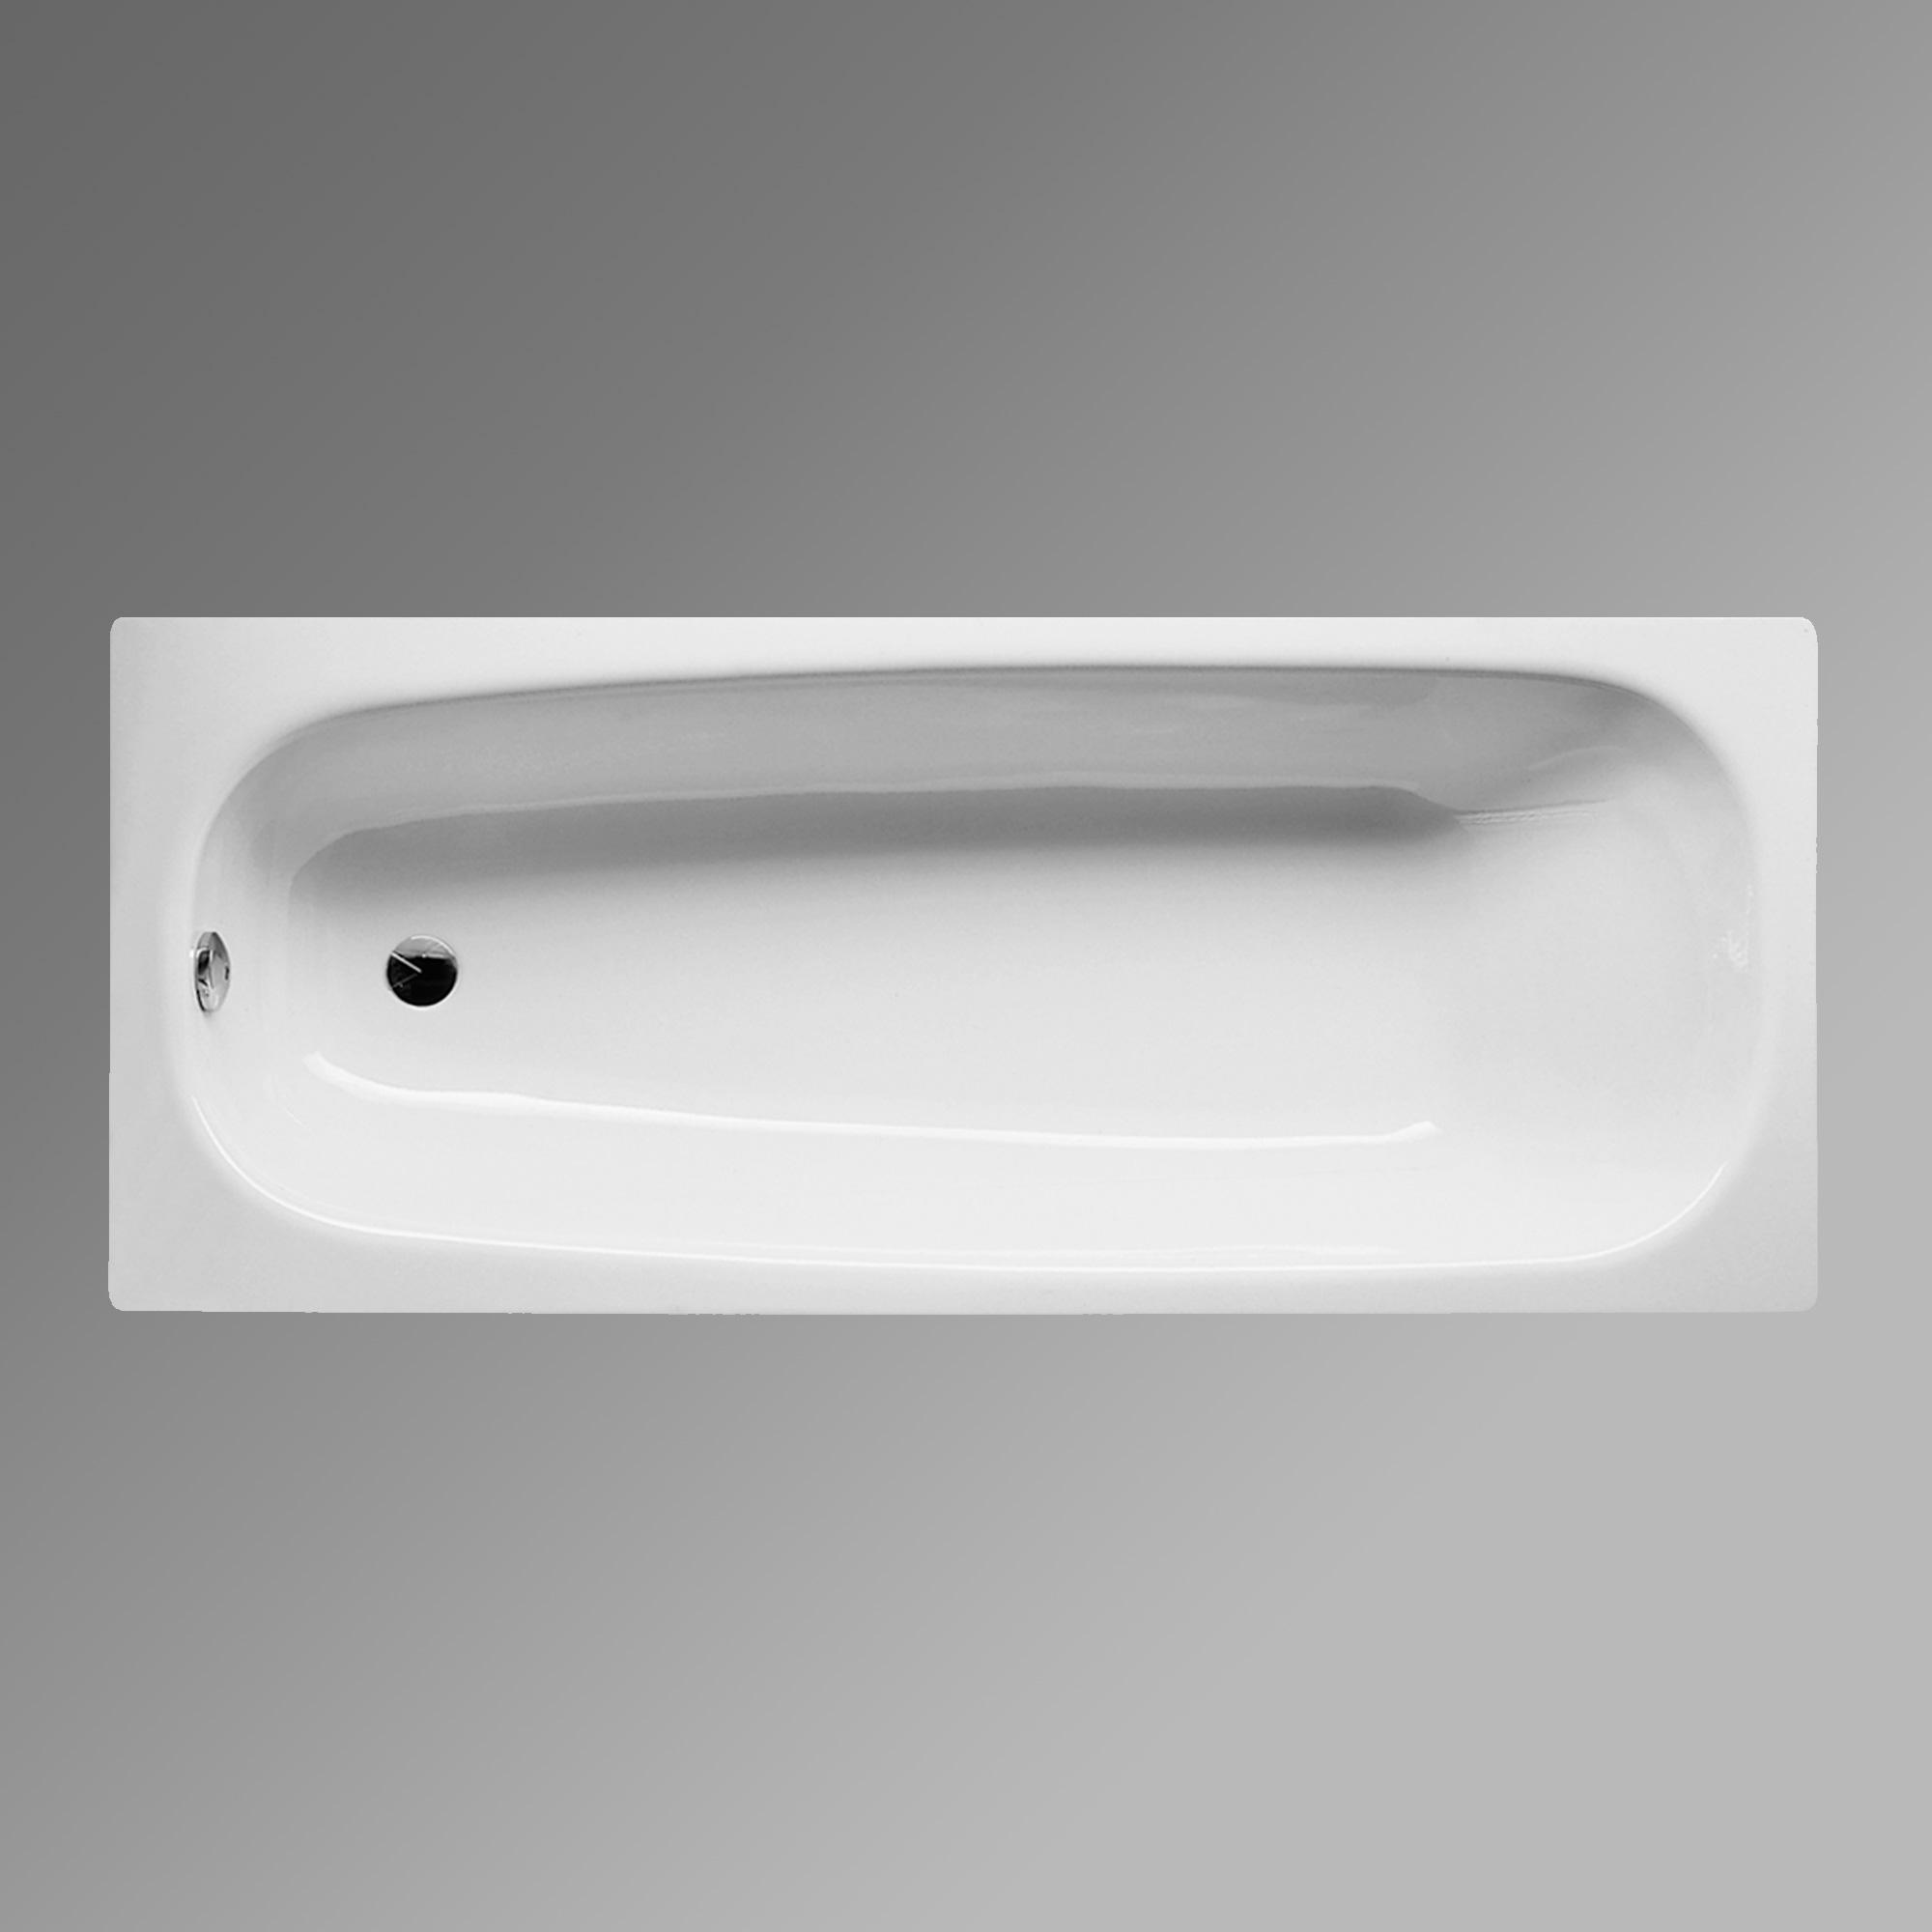 Bette Form Rechteck Badewanne weiss BetteGlasur - 3400-000PLUS ...